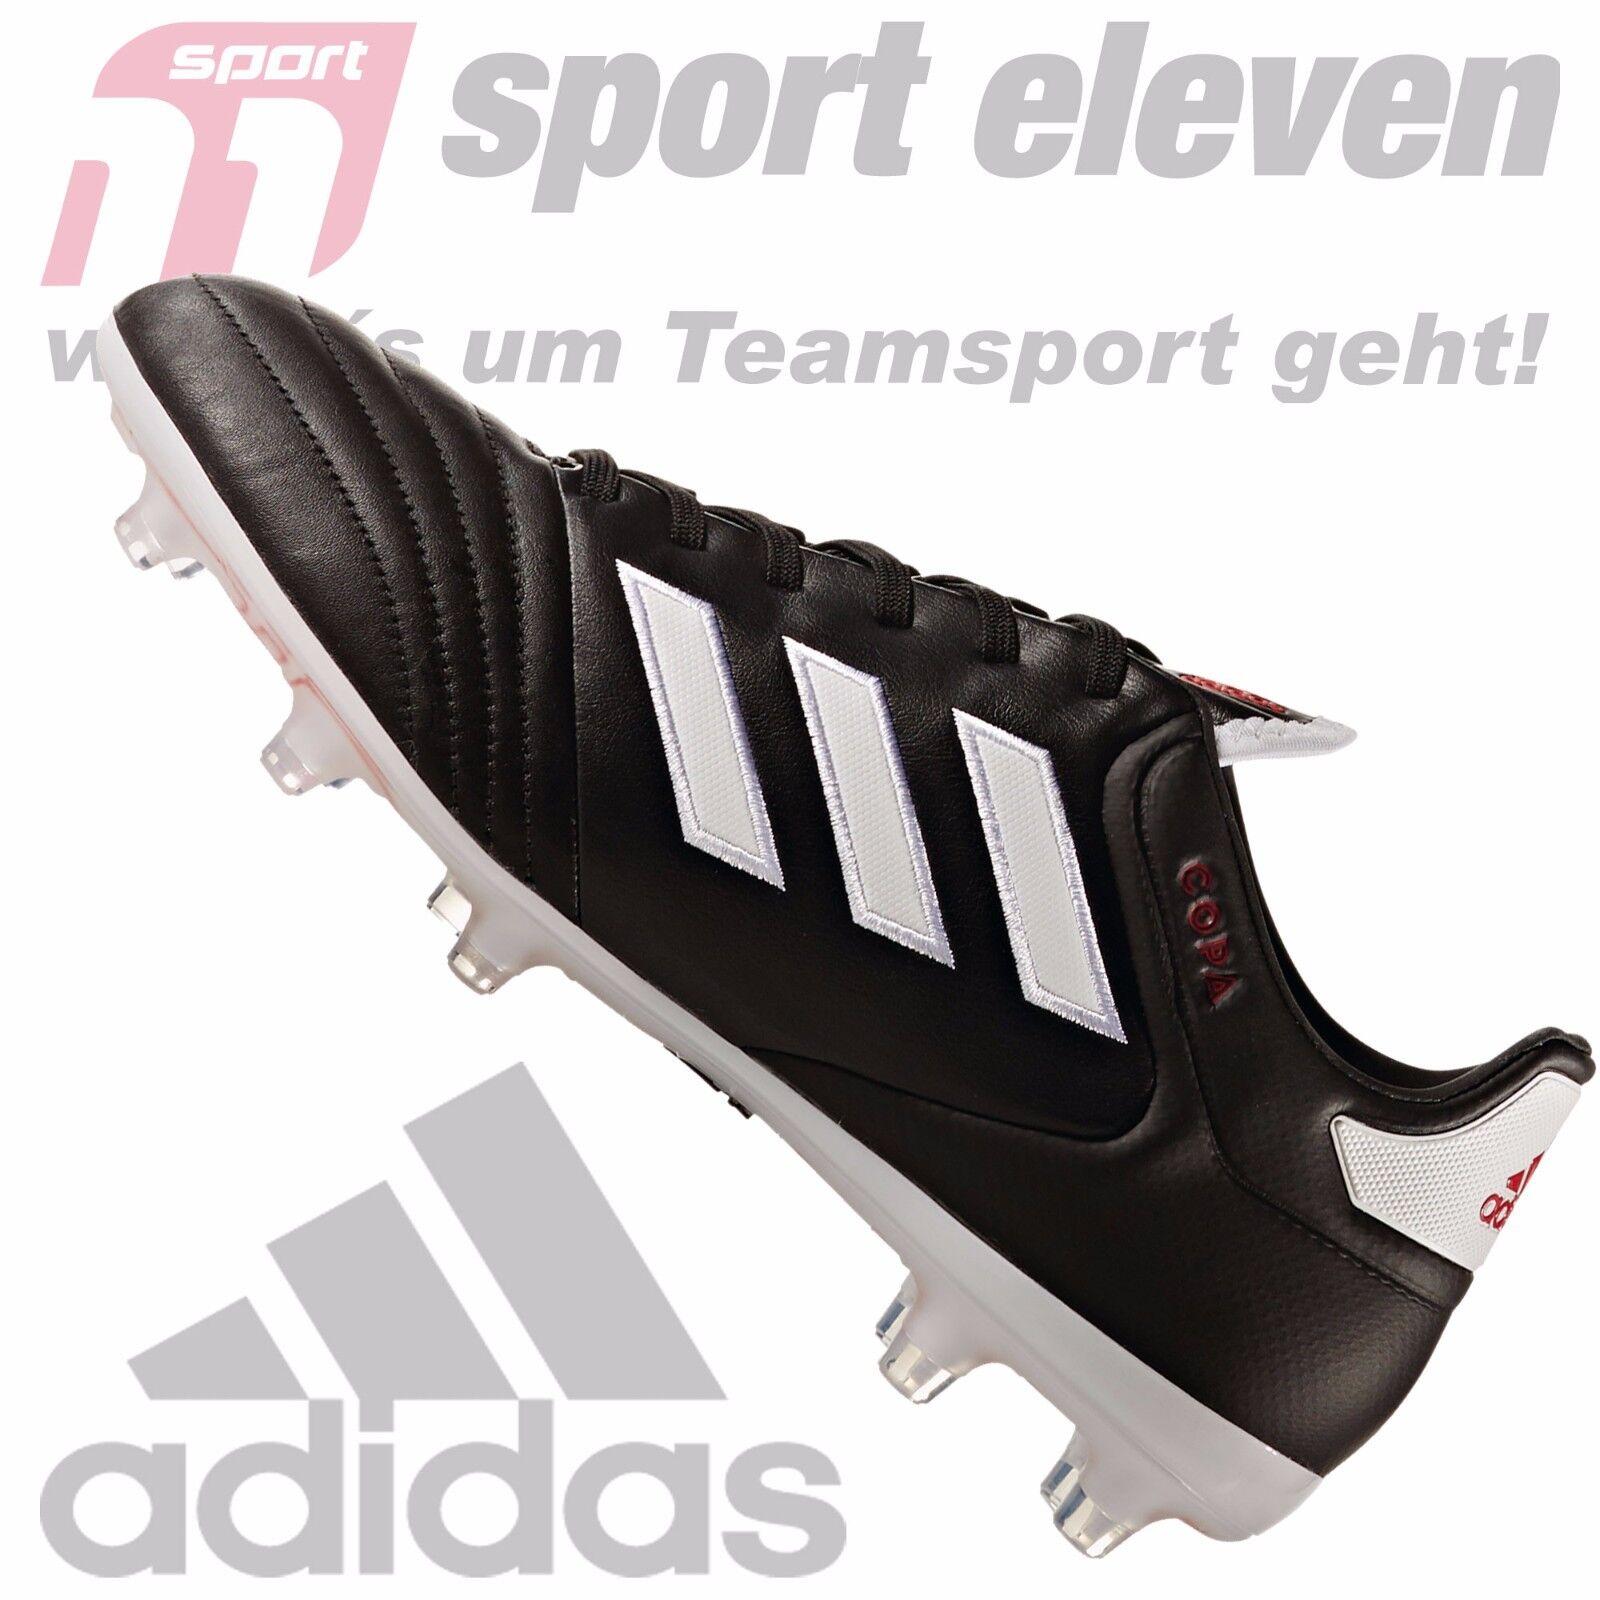 Adidas Fußballschuhe COPA 17.2 FG - - - BA8522 96c091